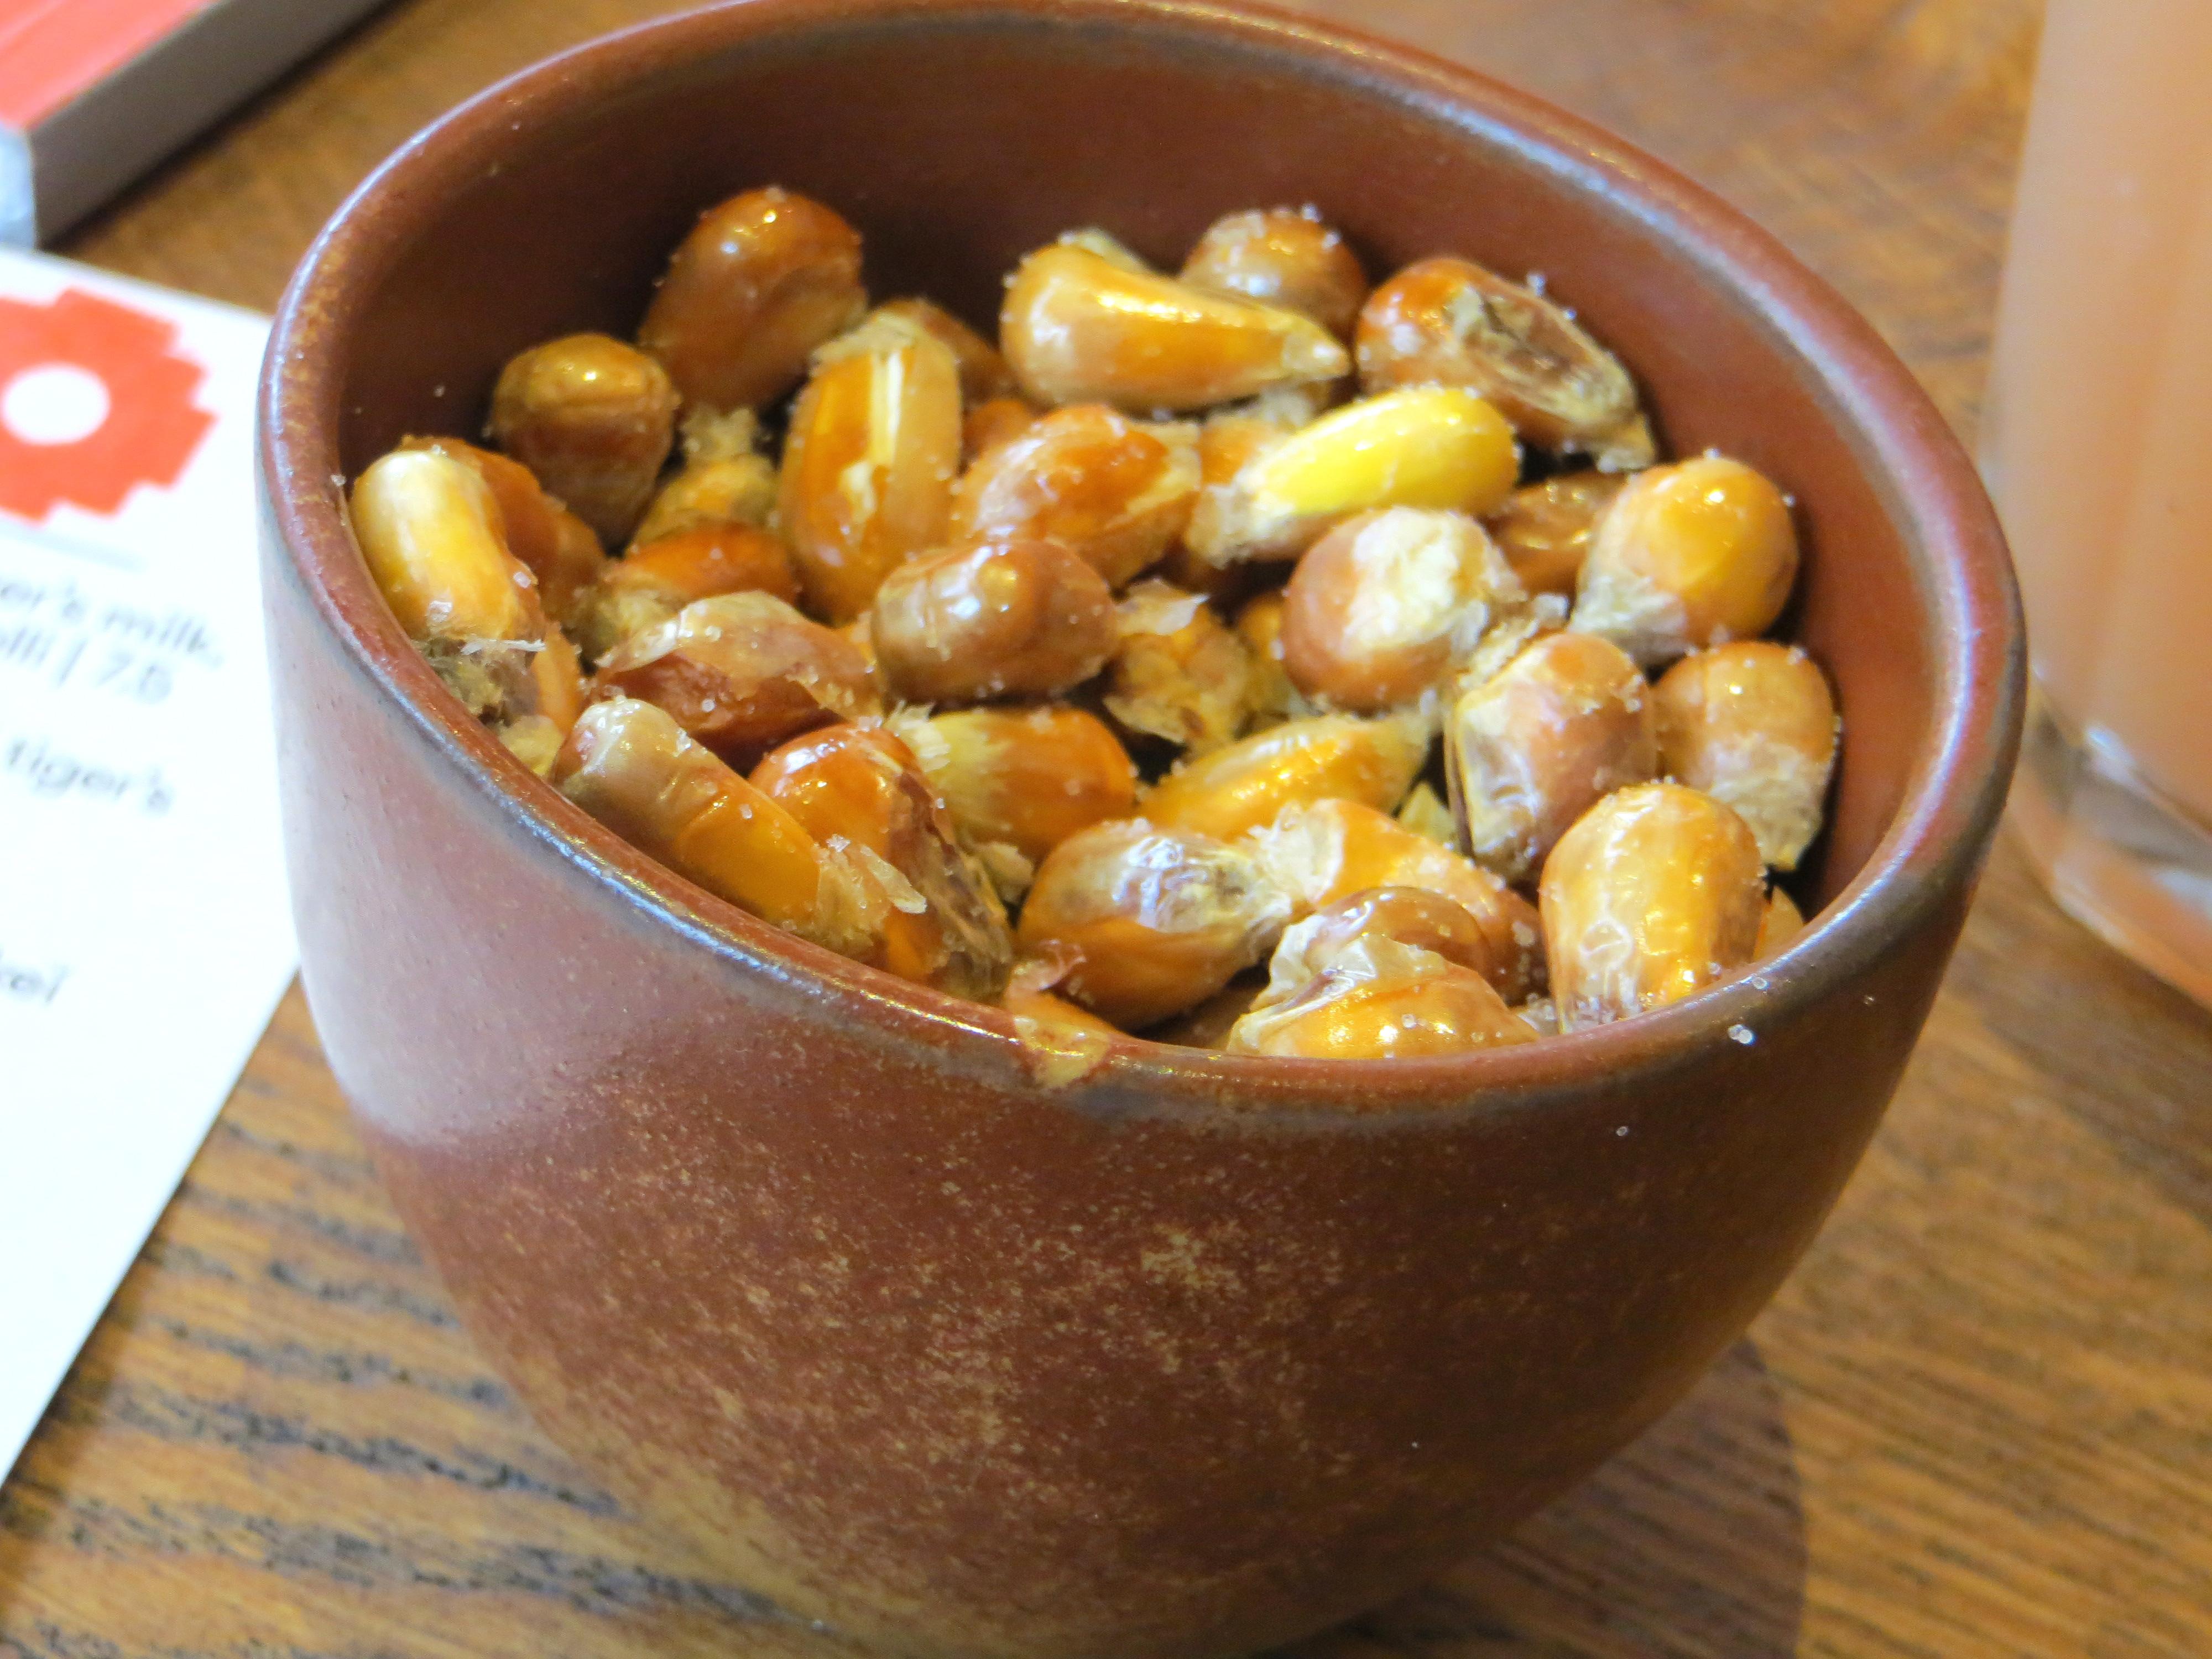 Cancha - Peruvian Corn